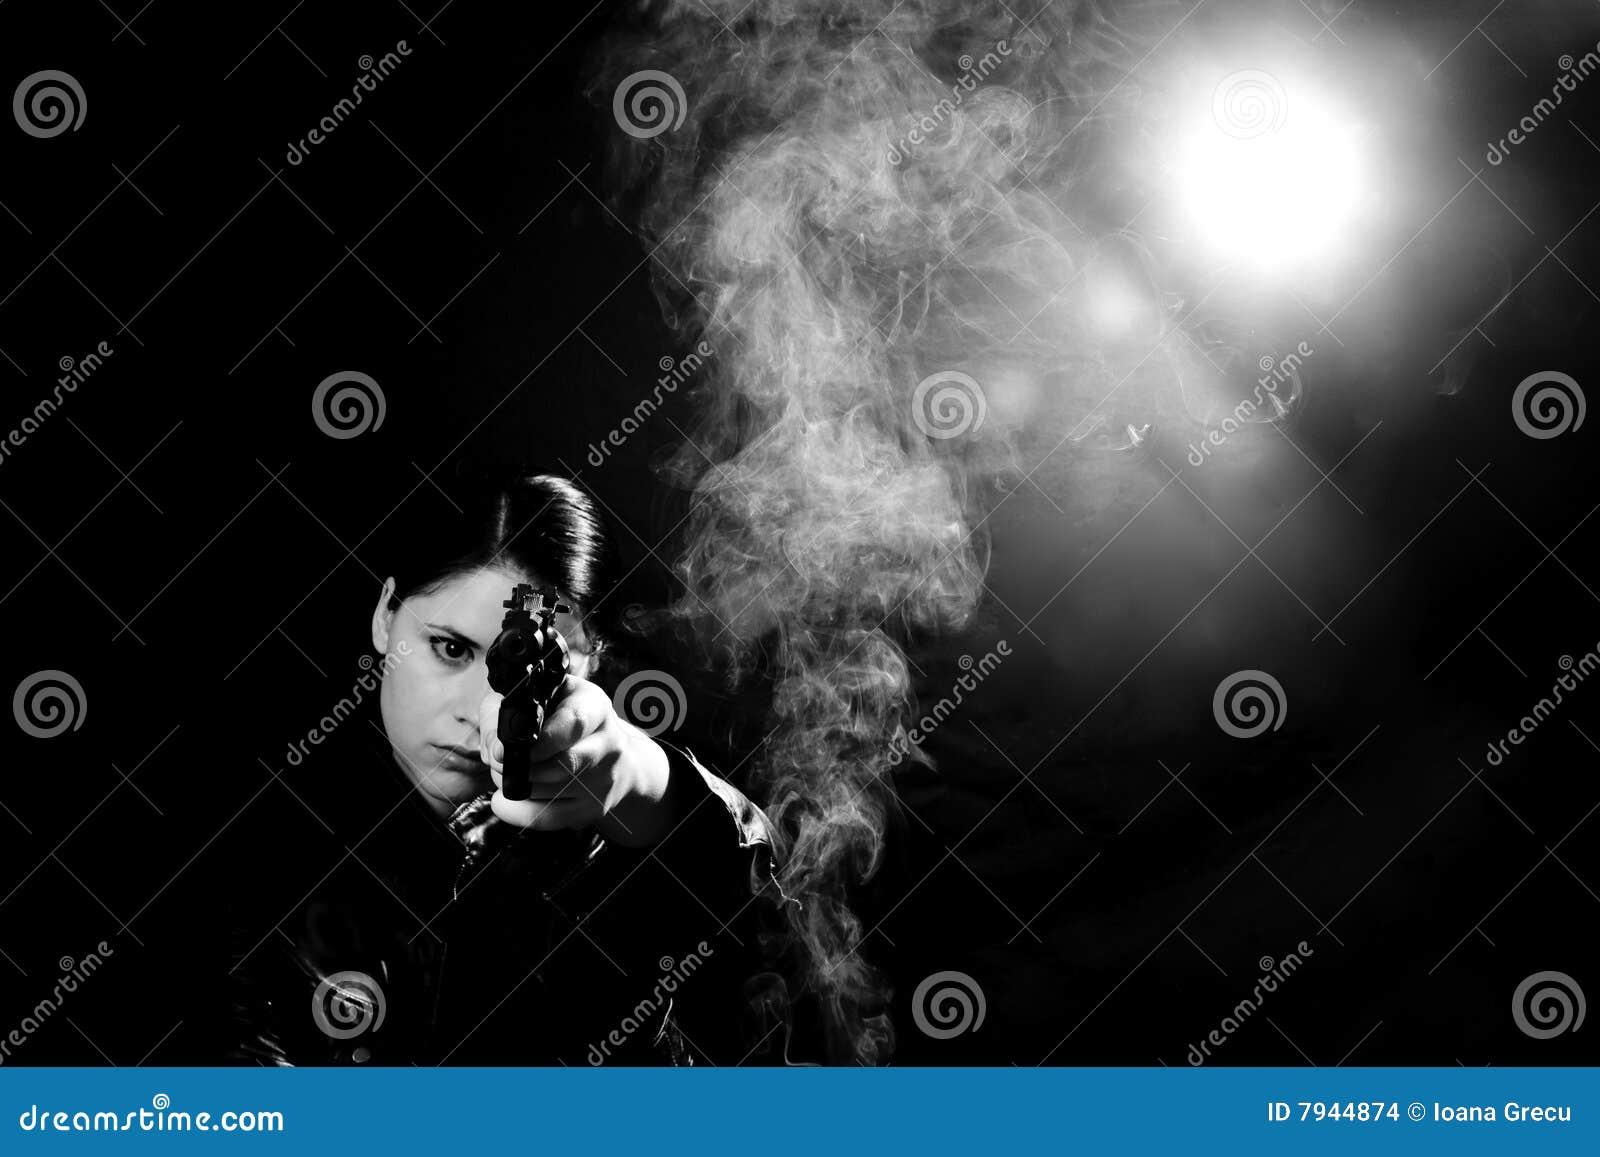 Woman detective with a gun